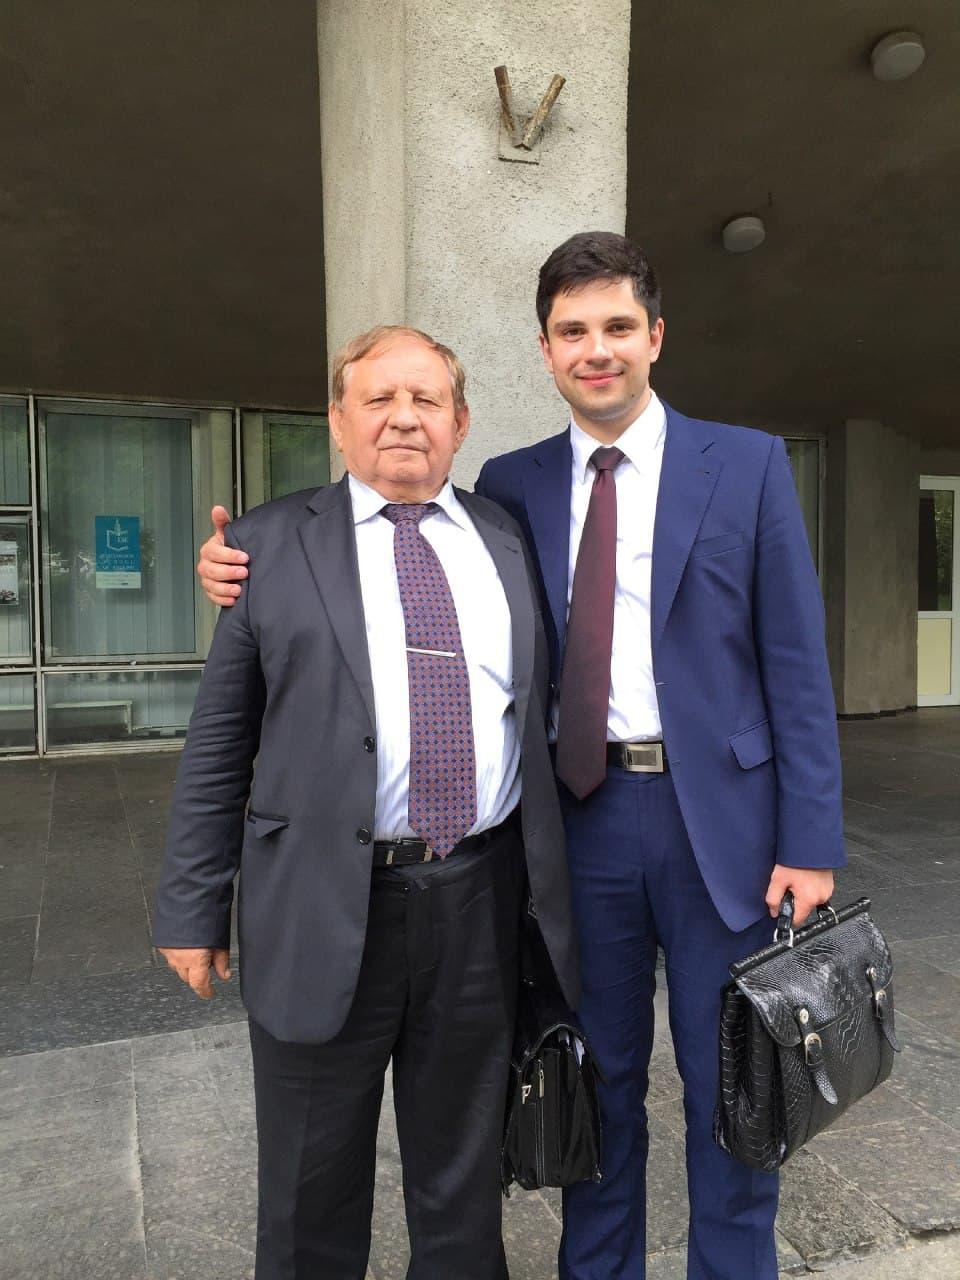 Александр Качура - юрист для фиктивных компаний, подлиза Зеленского